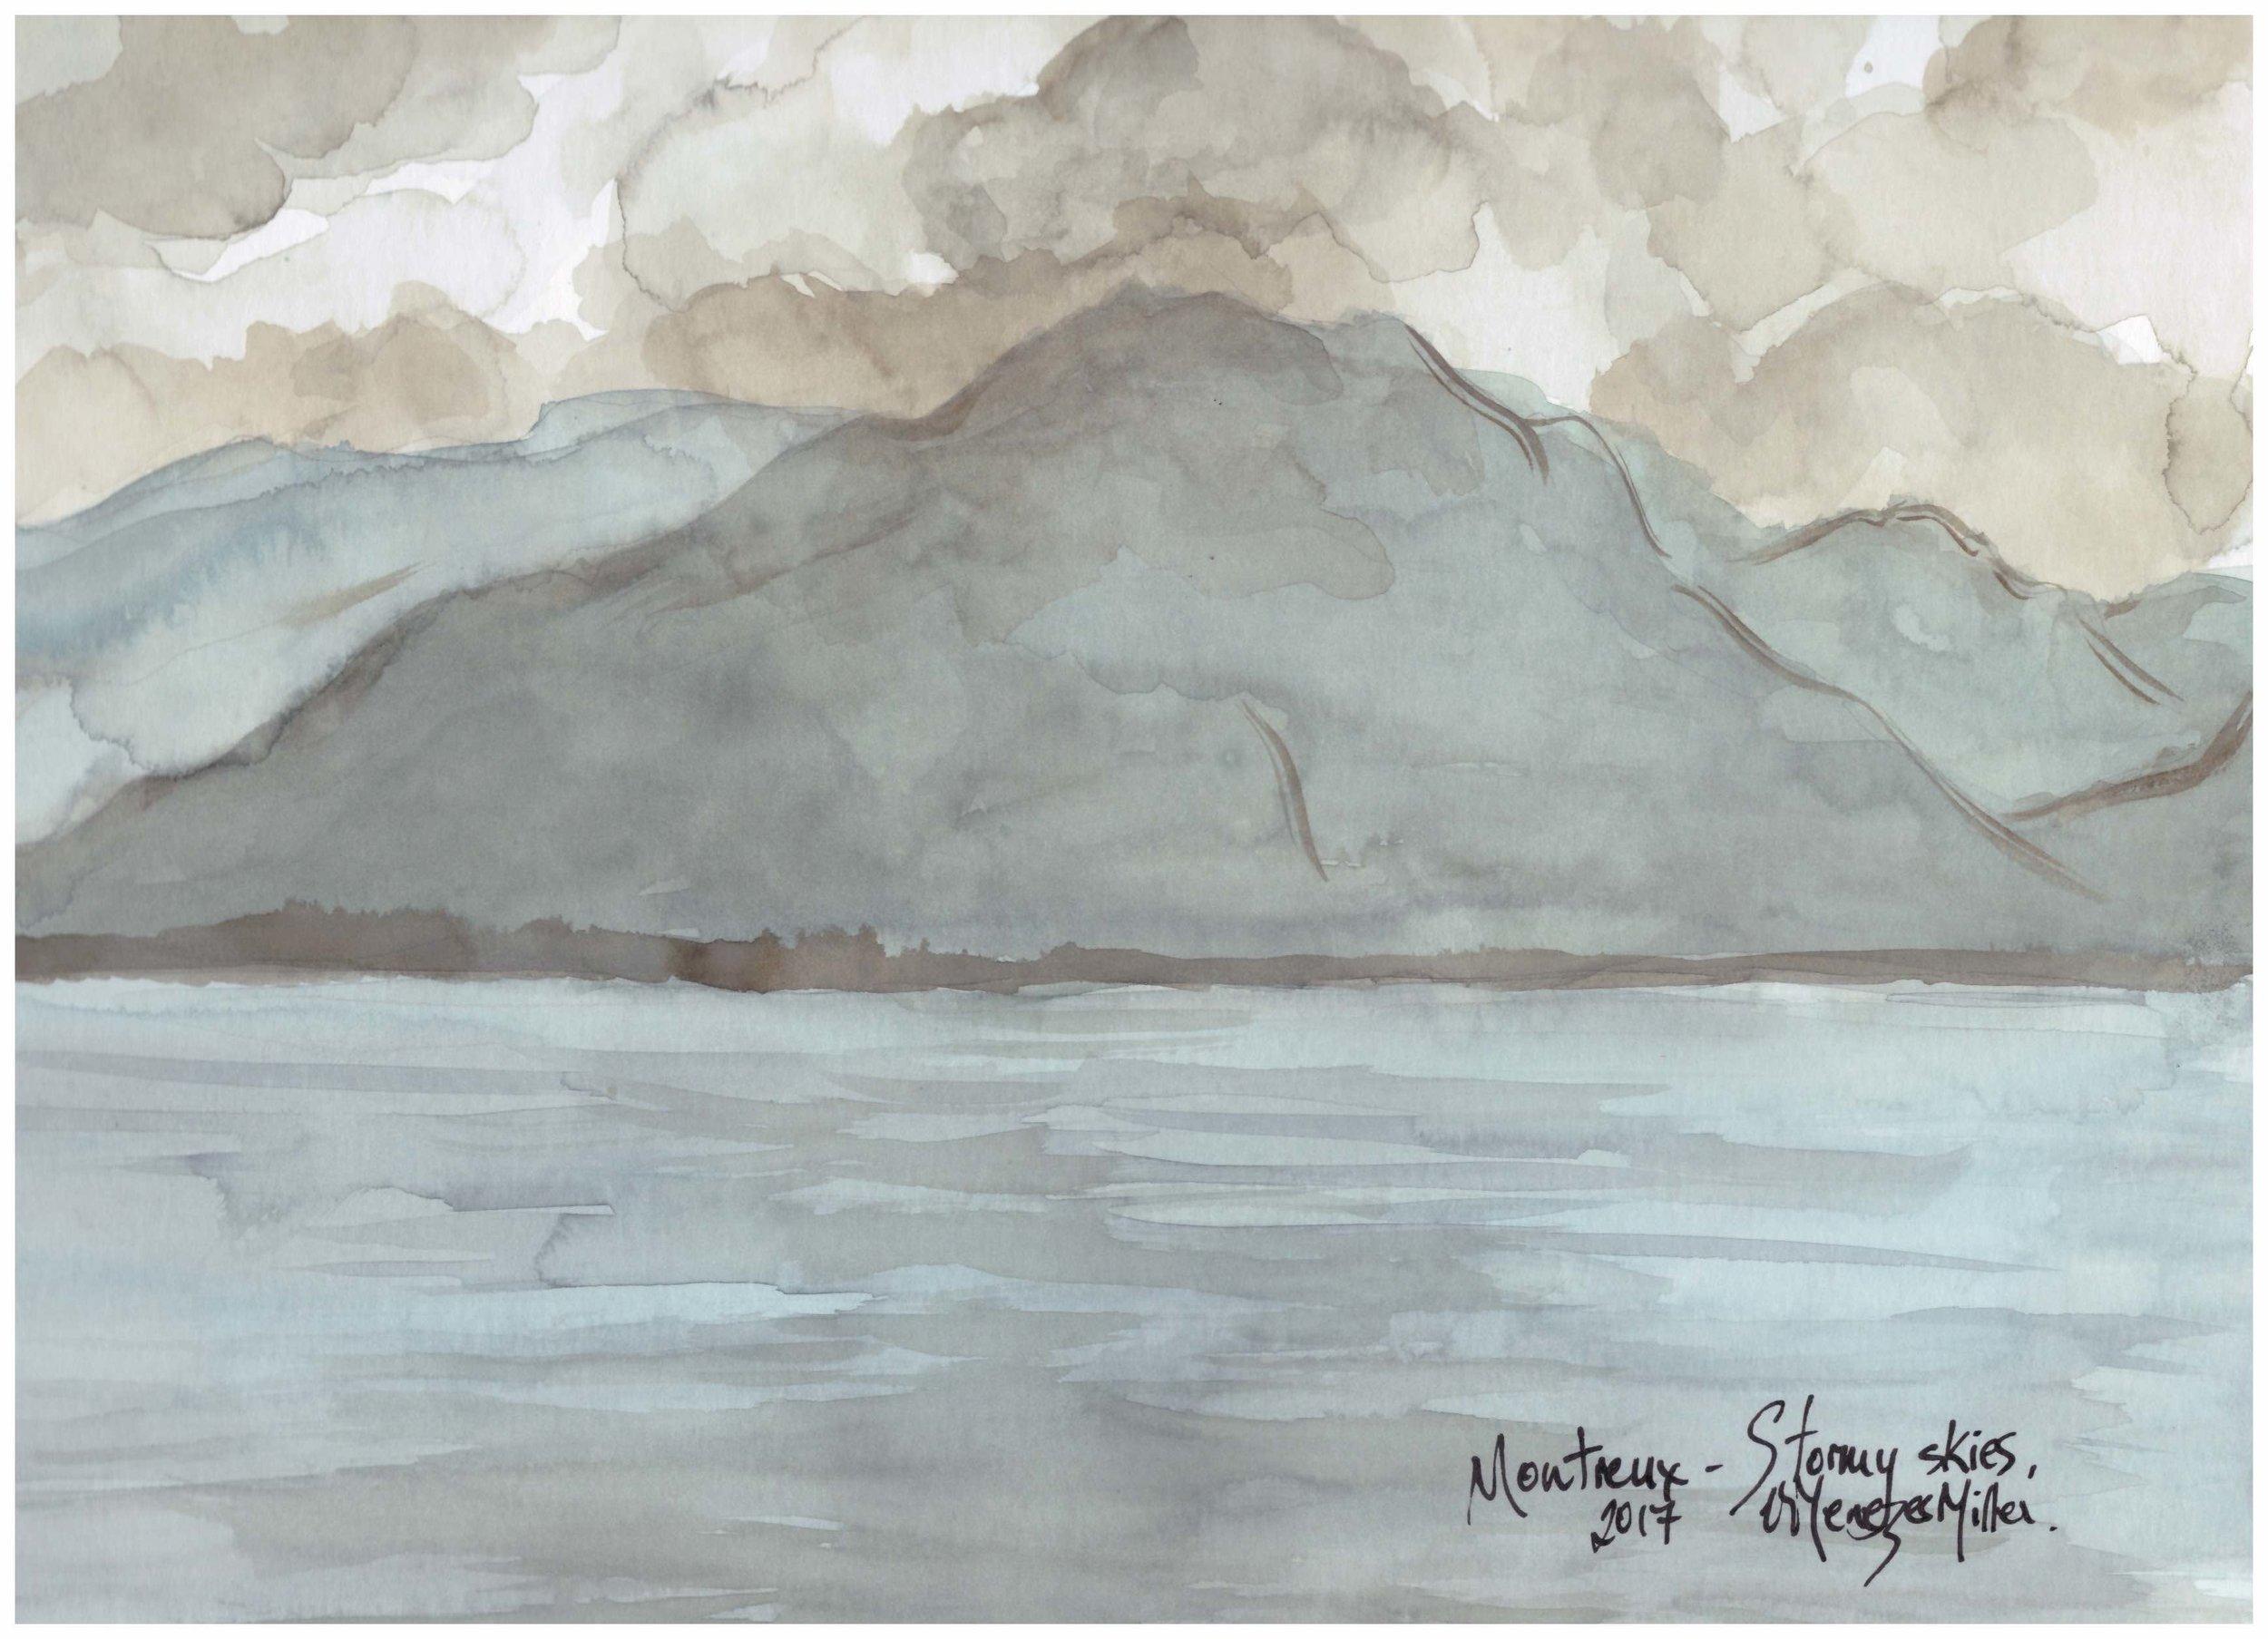 Montreux - Stormy skies